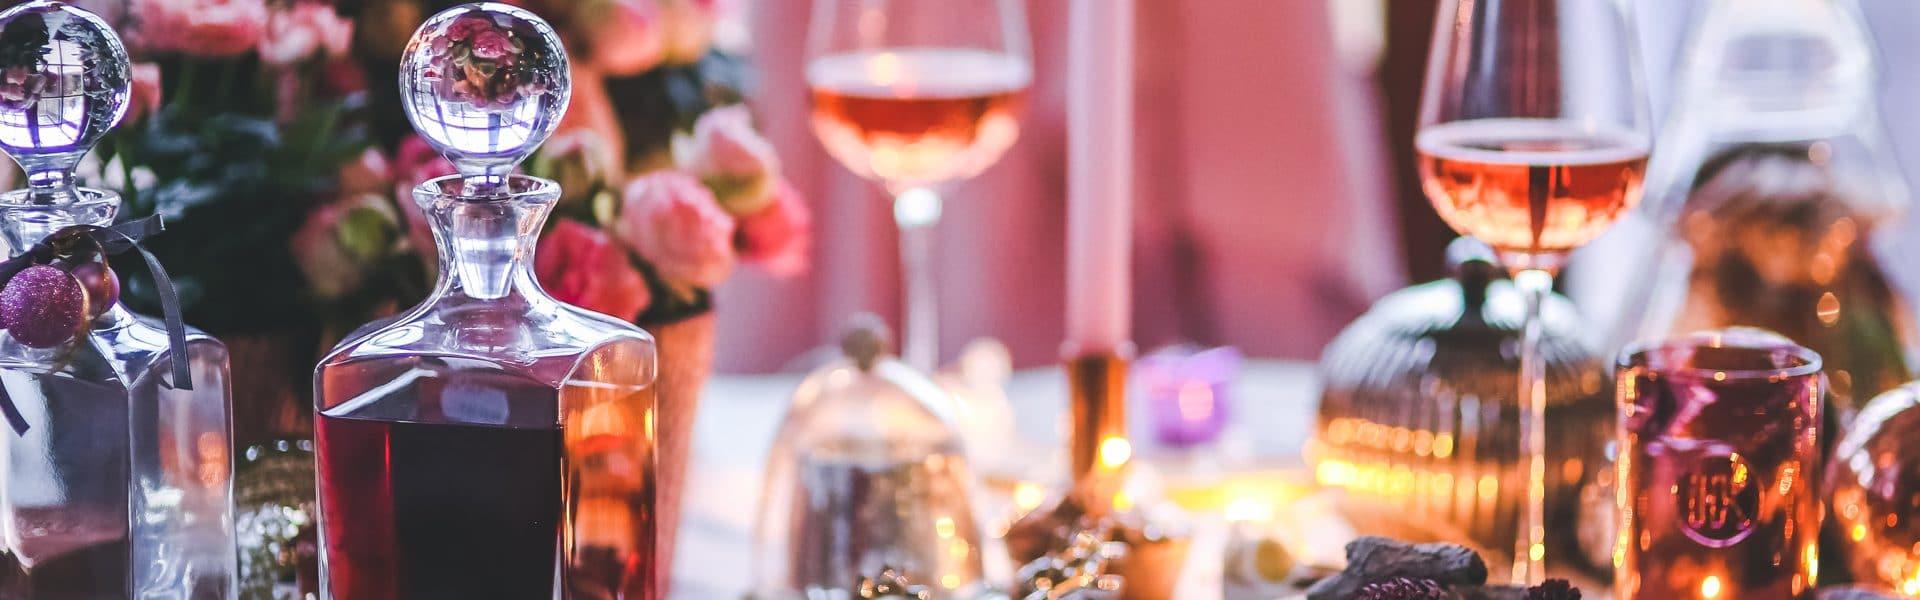 aerar vinho